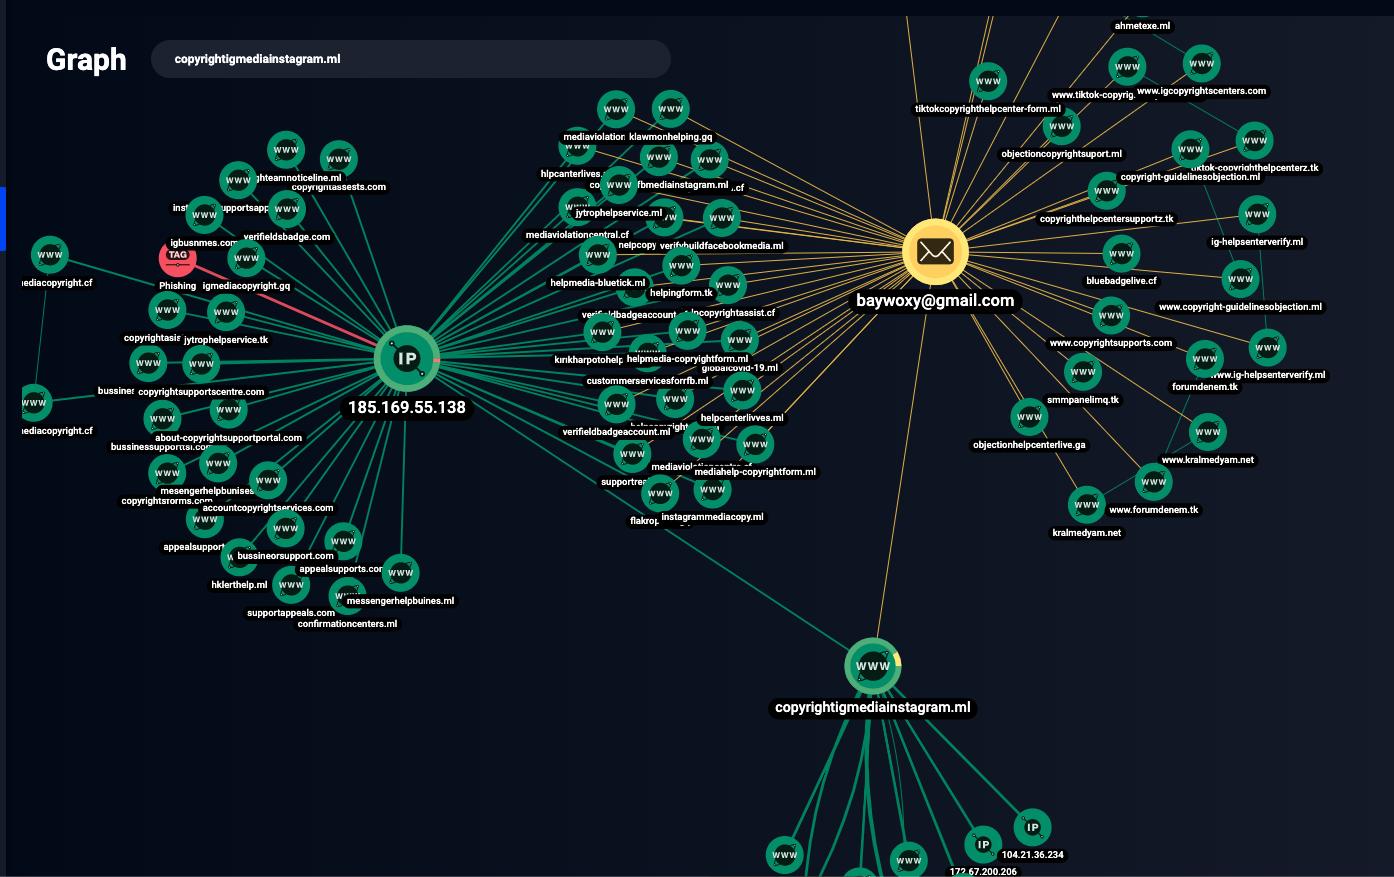 Graph network analysis